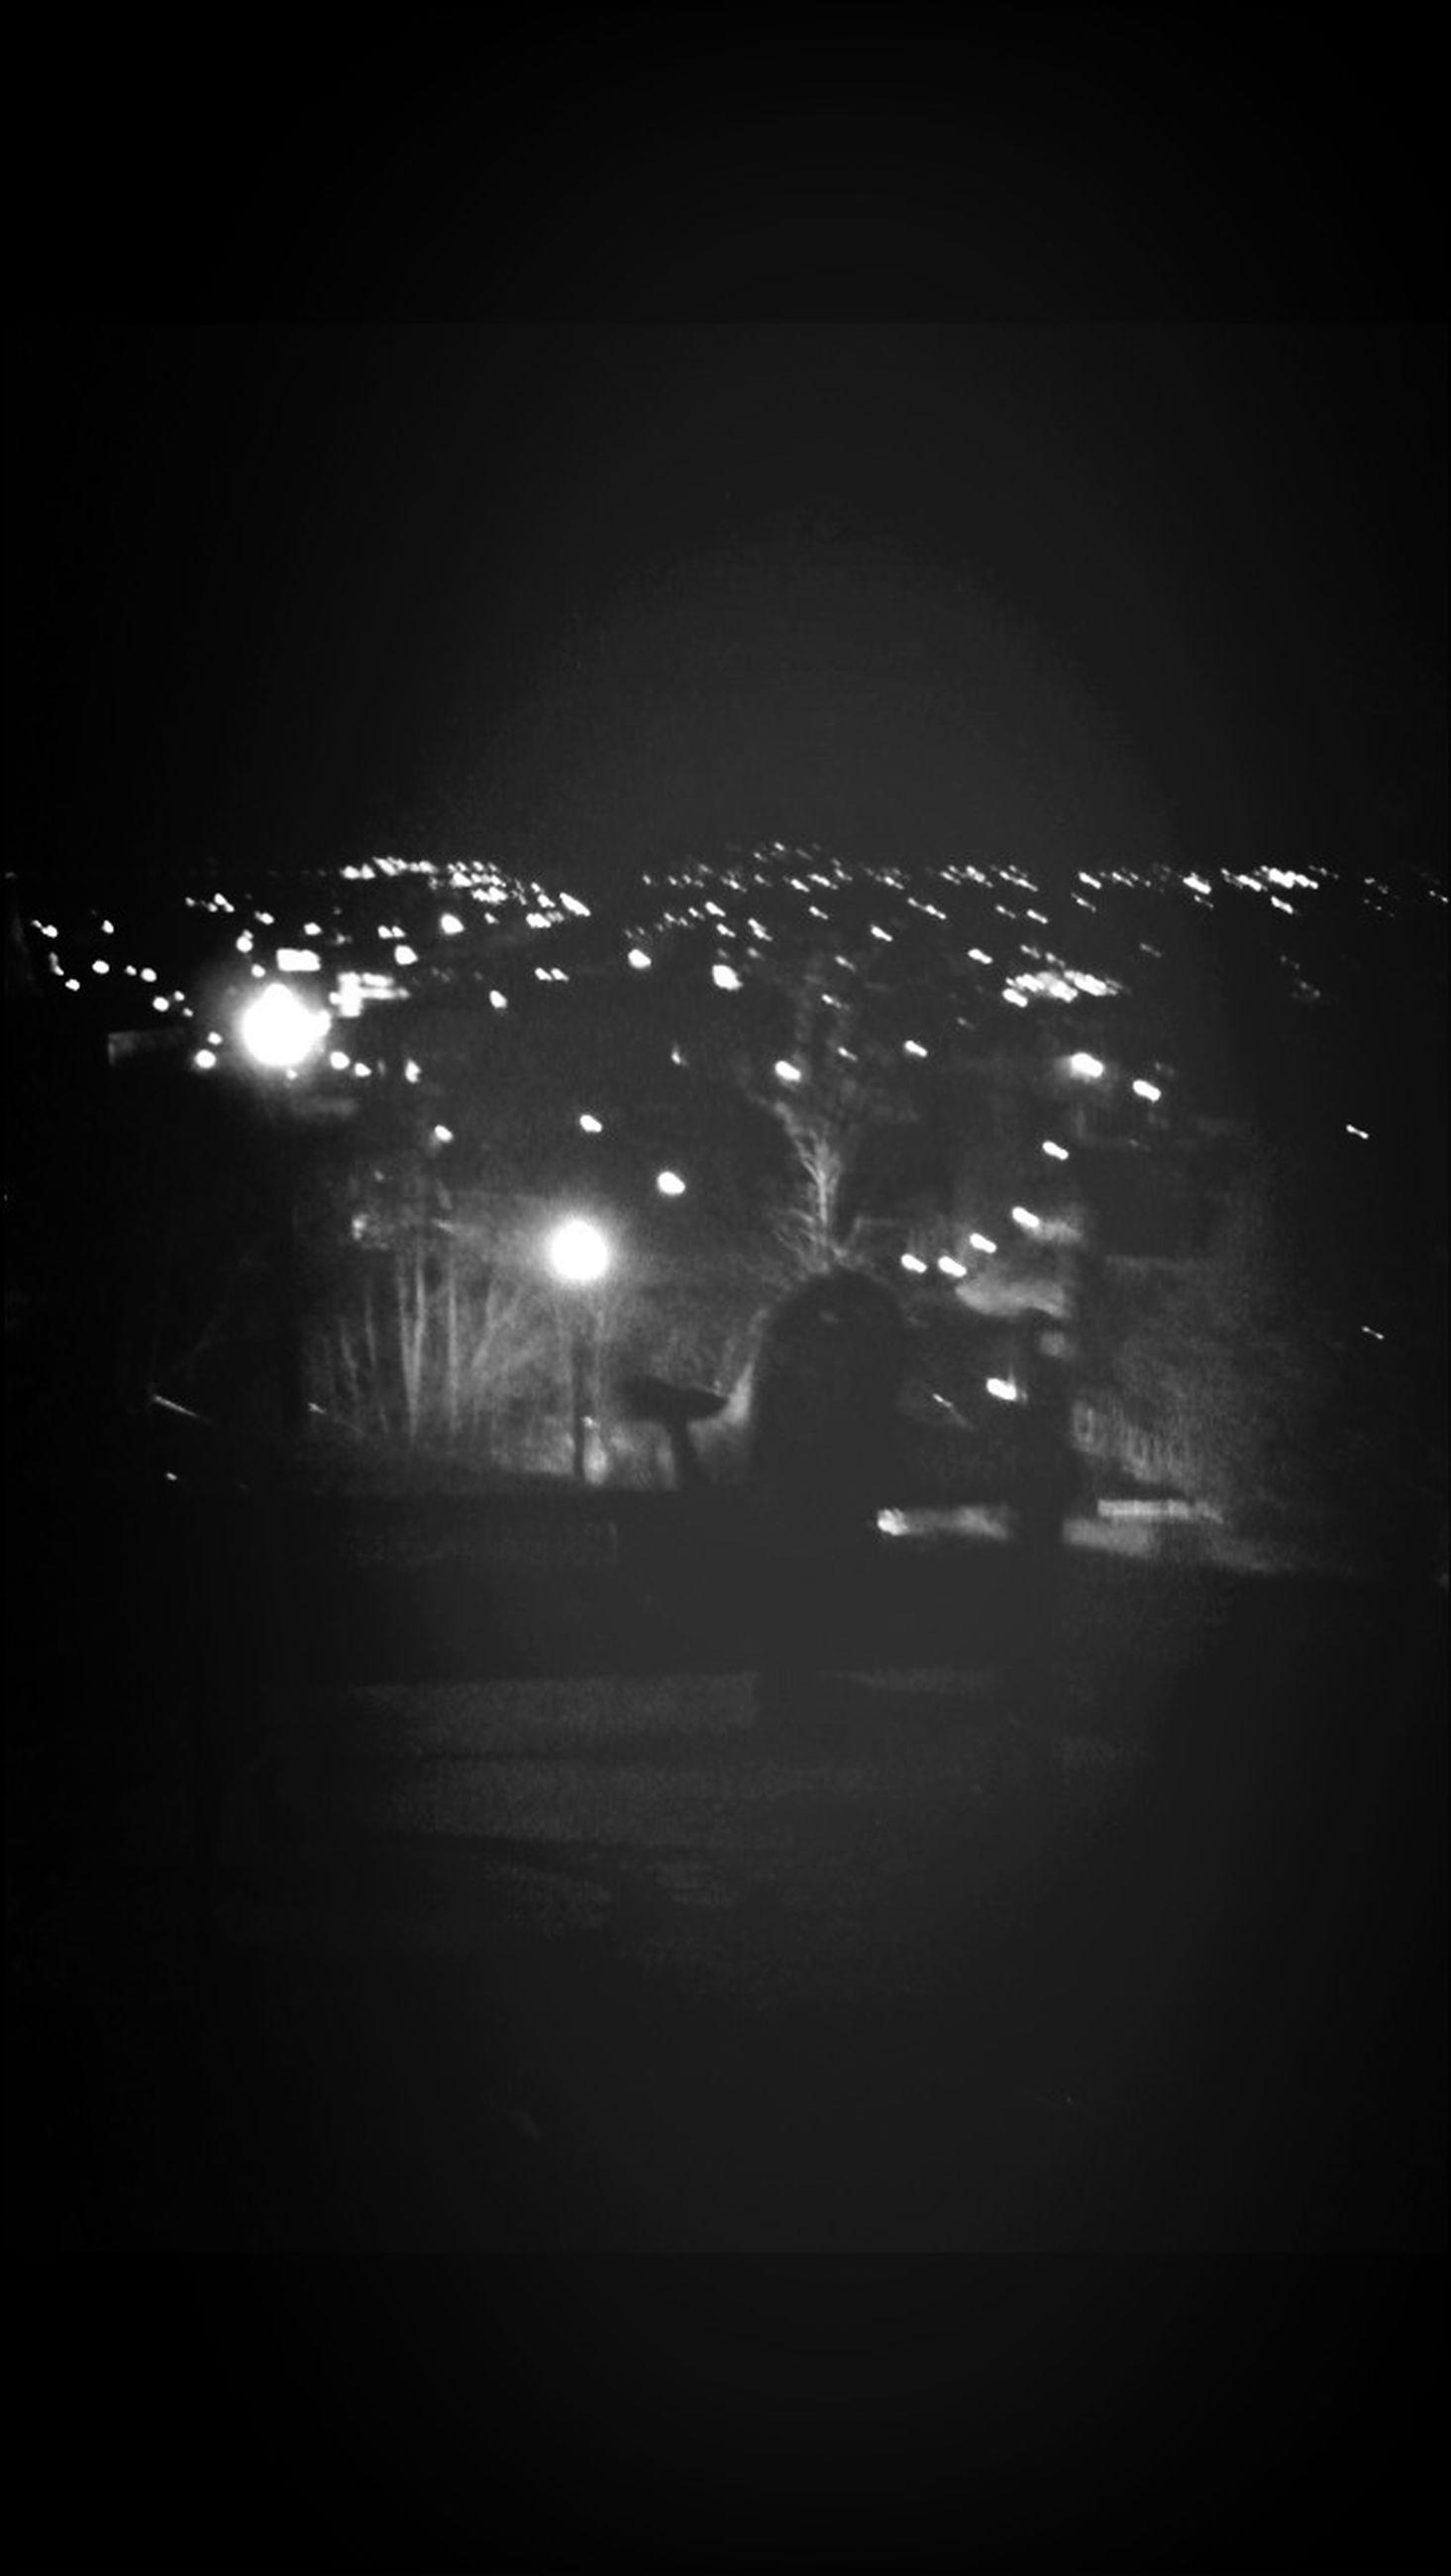 night, illuminated, dark, lifestyles, leisure activity, men, lighting equipment, copy space, building exterior, light - natural phenomenon, city, street, built structure, architecture, full length, unrecognizable person, standing, silhouette